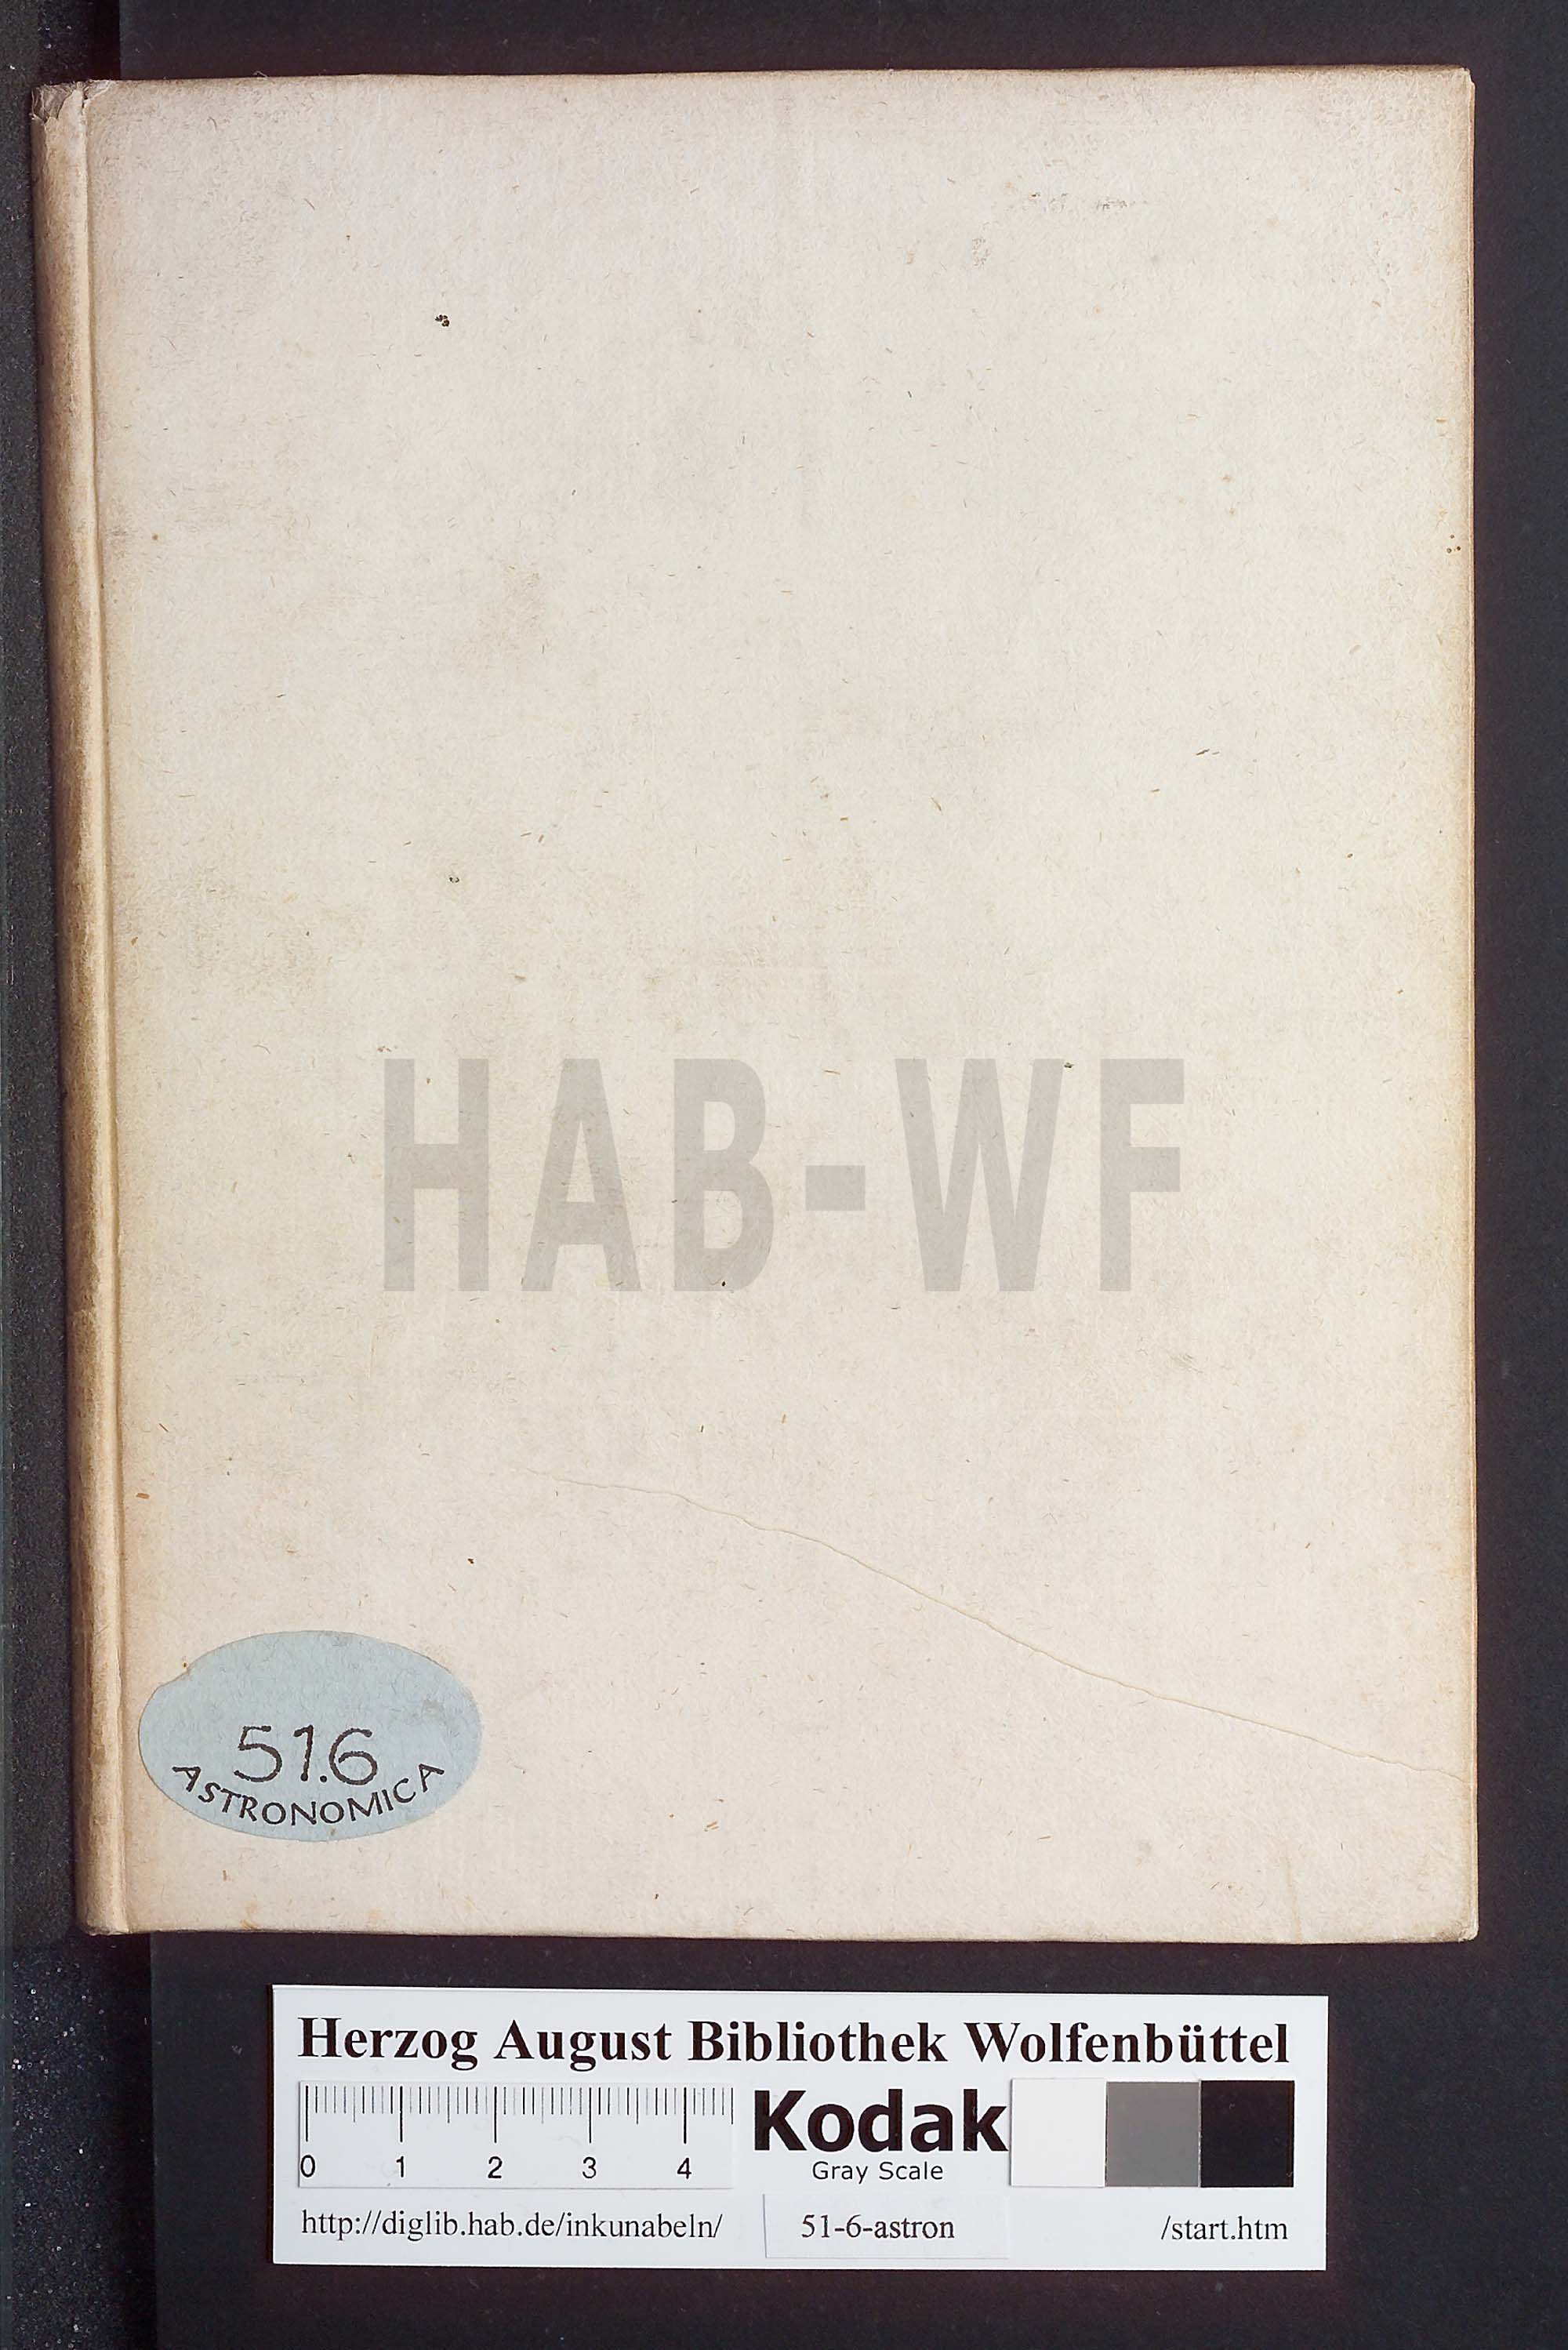 http://diglib.hab.de/inkunabeln/51-6-astron/max/00001.jpg